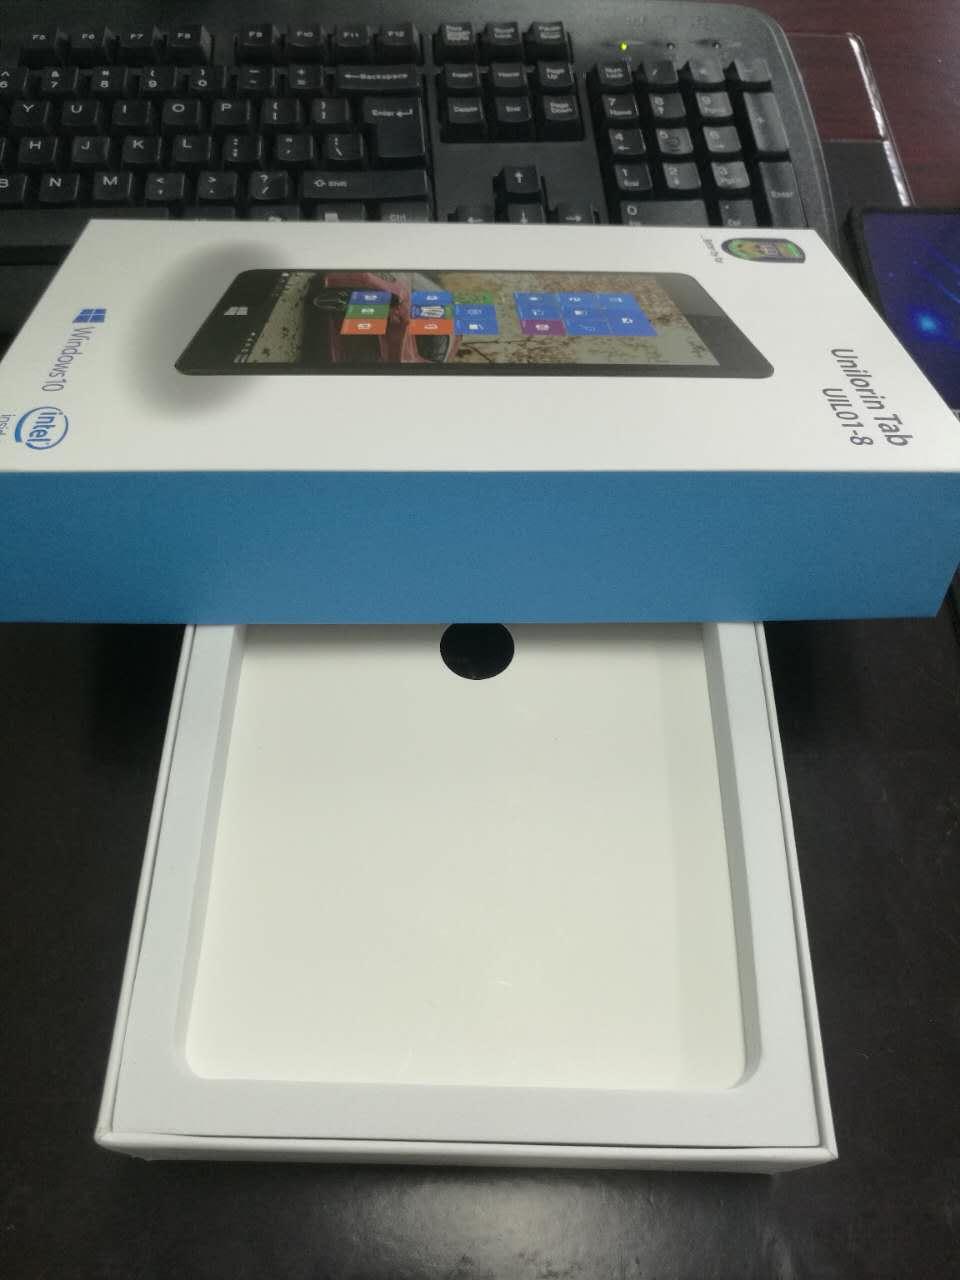 Tradeguide24 com - 8 inch Win 10 2G 16G tablet PC stocklot 6000pcs